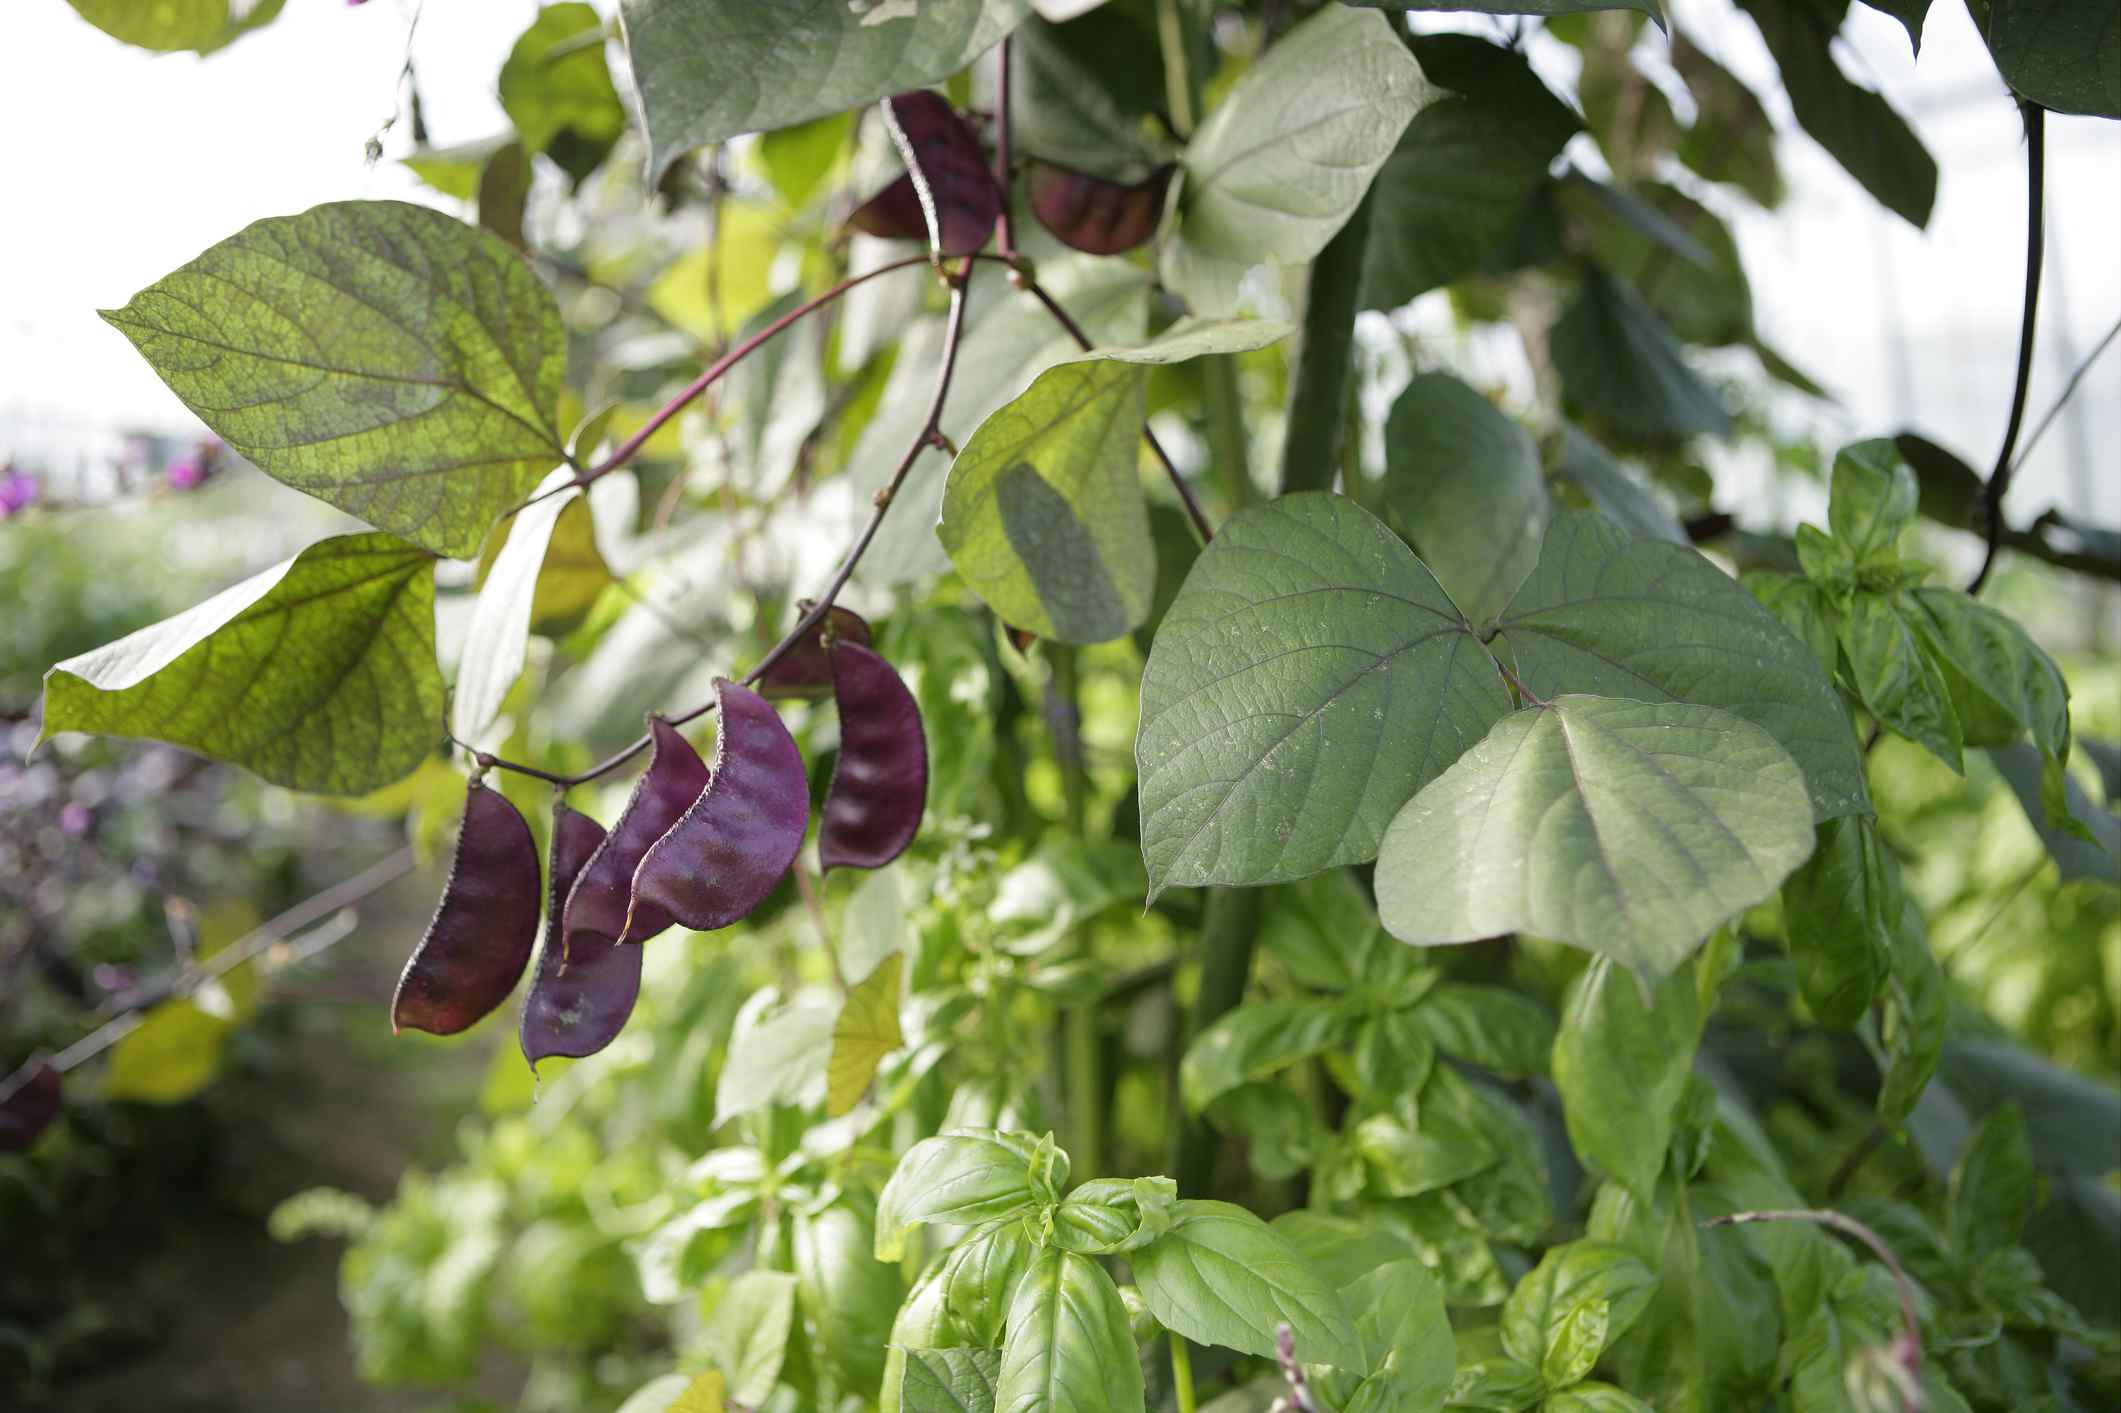 Purple Hyacinth beans in a garden